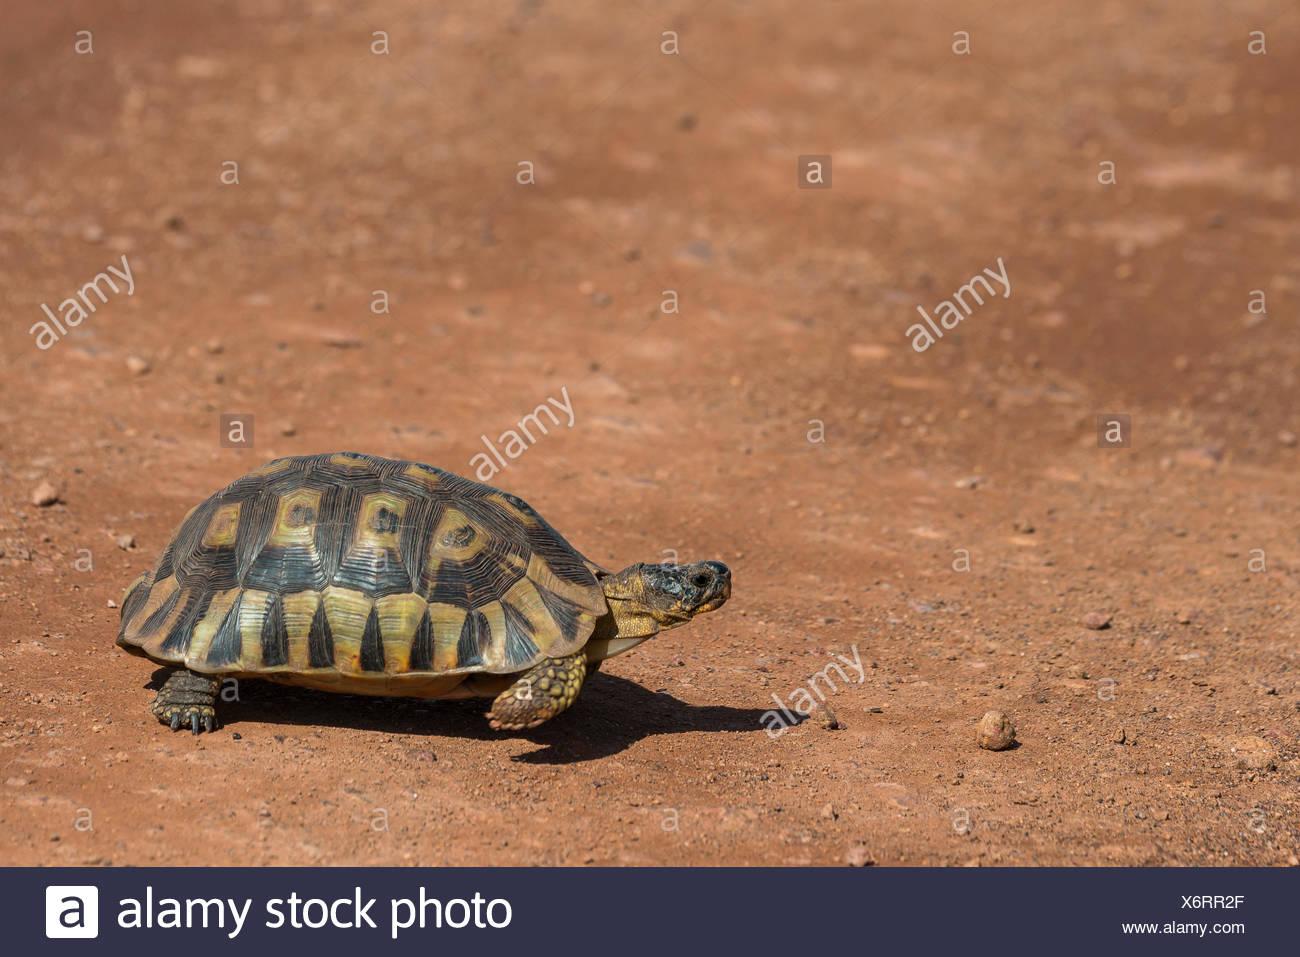 Angulate tortoise (Chersina angulata), endangered species, Province Western Cape, South Africa - Stock Image